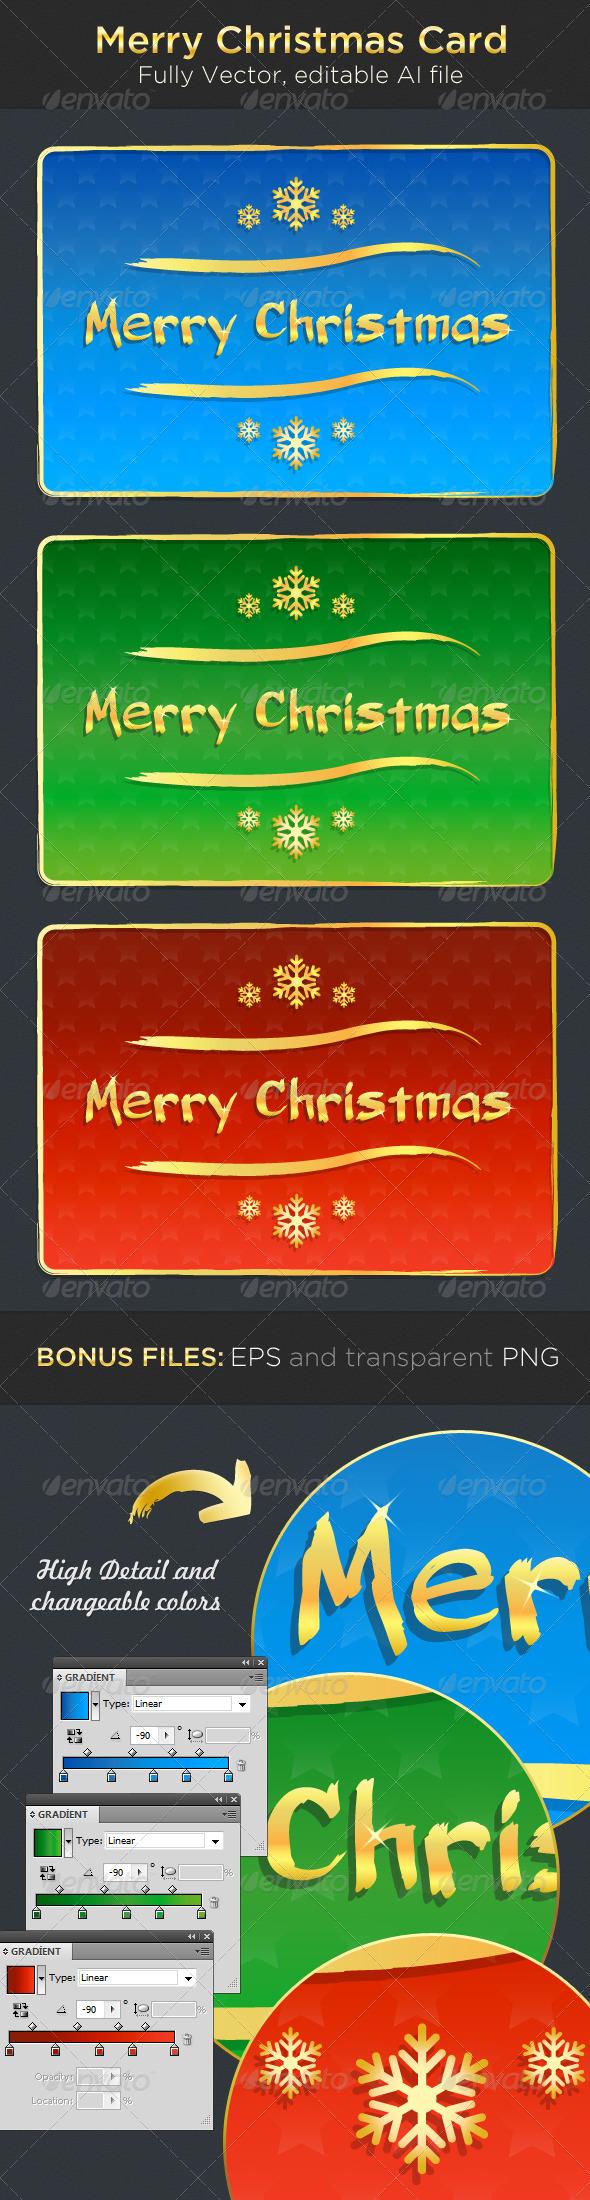 GraphicRiver Merry Christmas Card 3365346